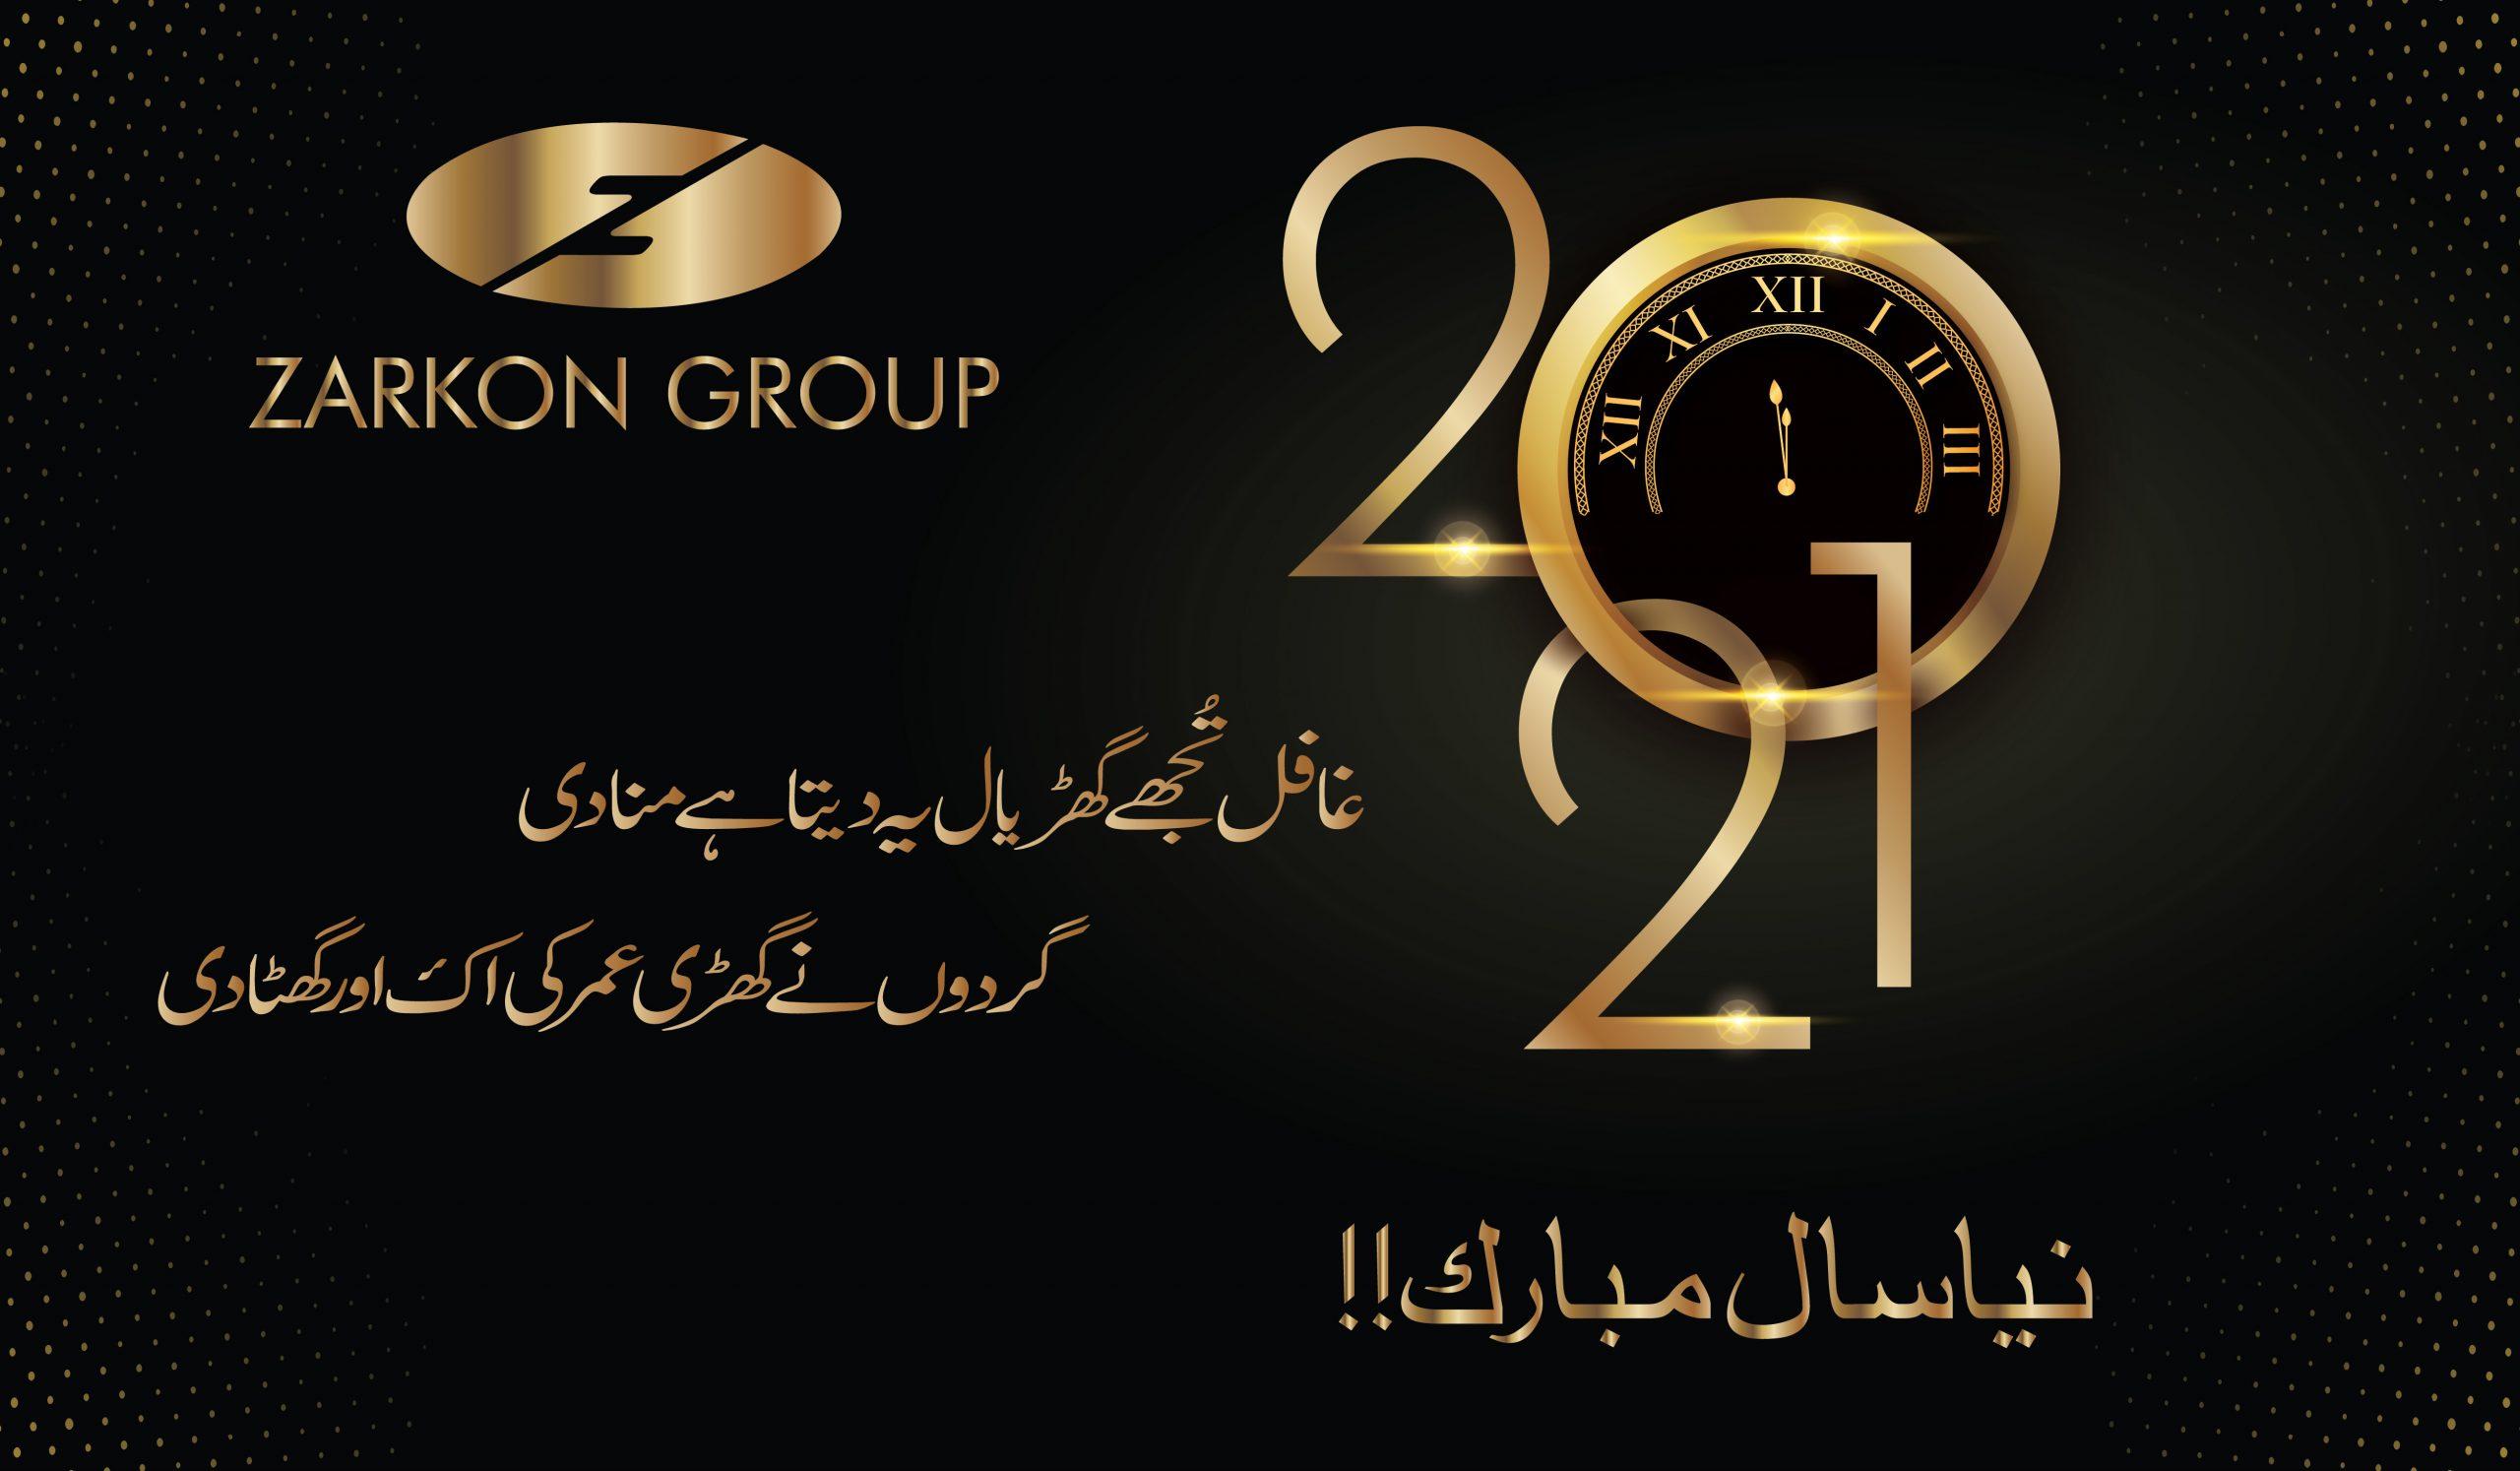 Happy New Year 2021 Zarkon Group Real Estate Developer & Property Builder Blog Post Urdu - FAH33M